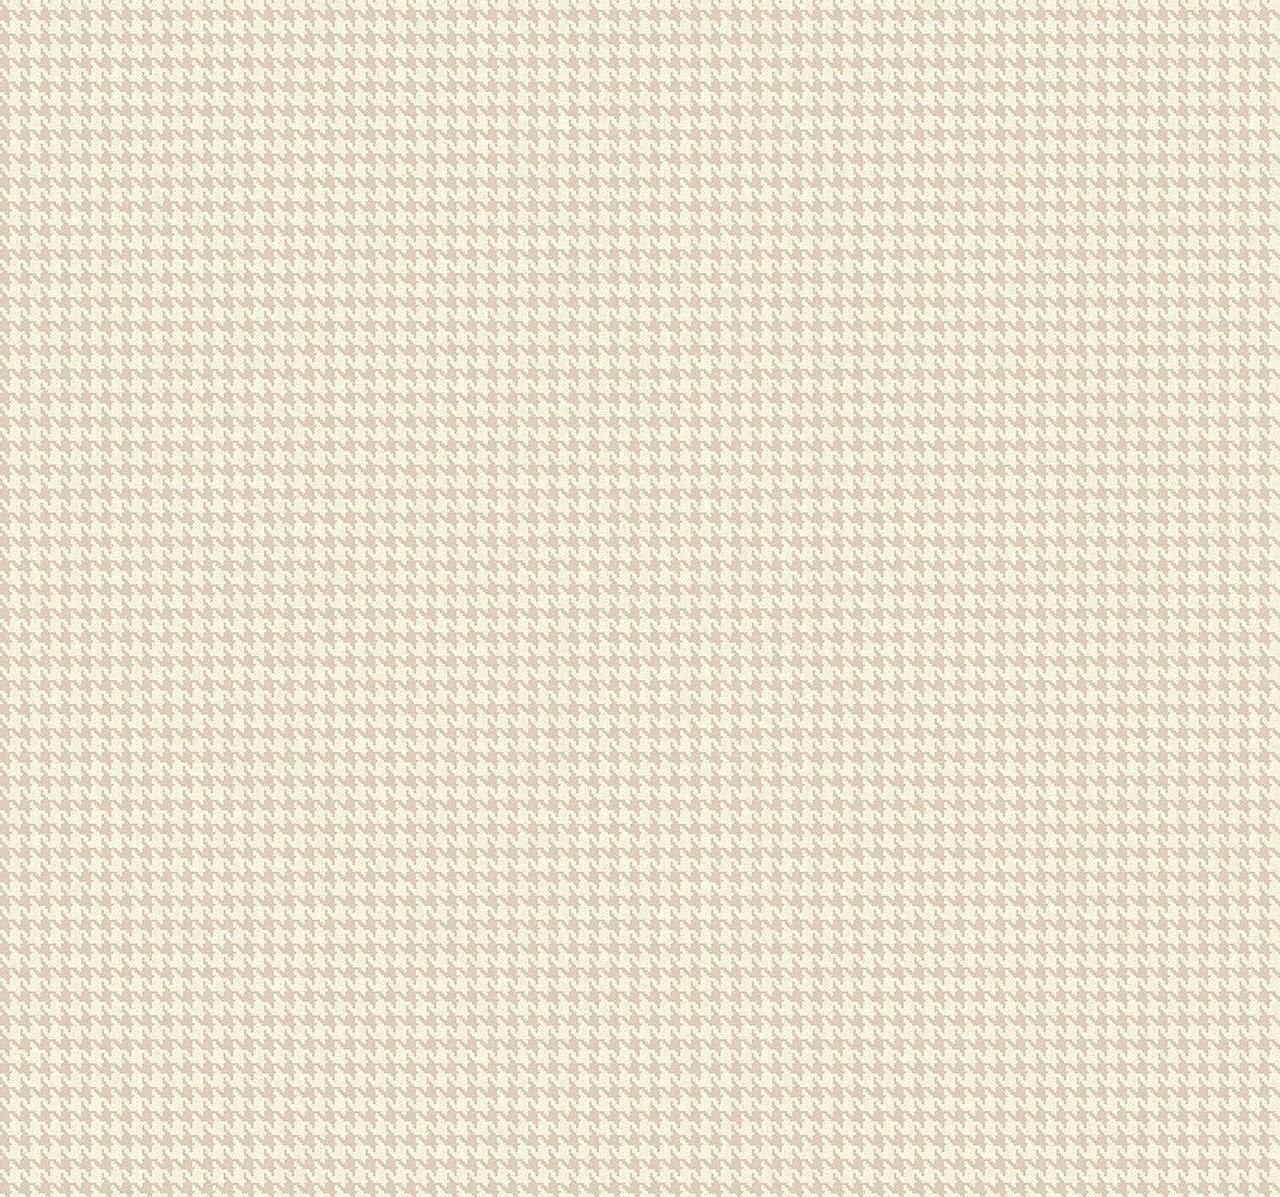 York Wallcoverings Magnolia Home Artful Prints And Patterns 56 Sq Ft White Paper Stripes Prepasted Soak And Hang Wallpaper Lowes Com Magnolia Homes Herringbone Wallpaper Pick Up Sticks